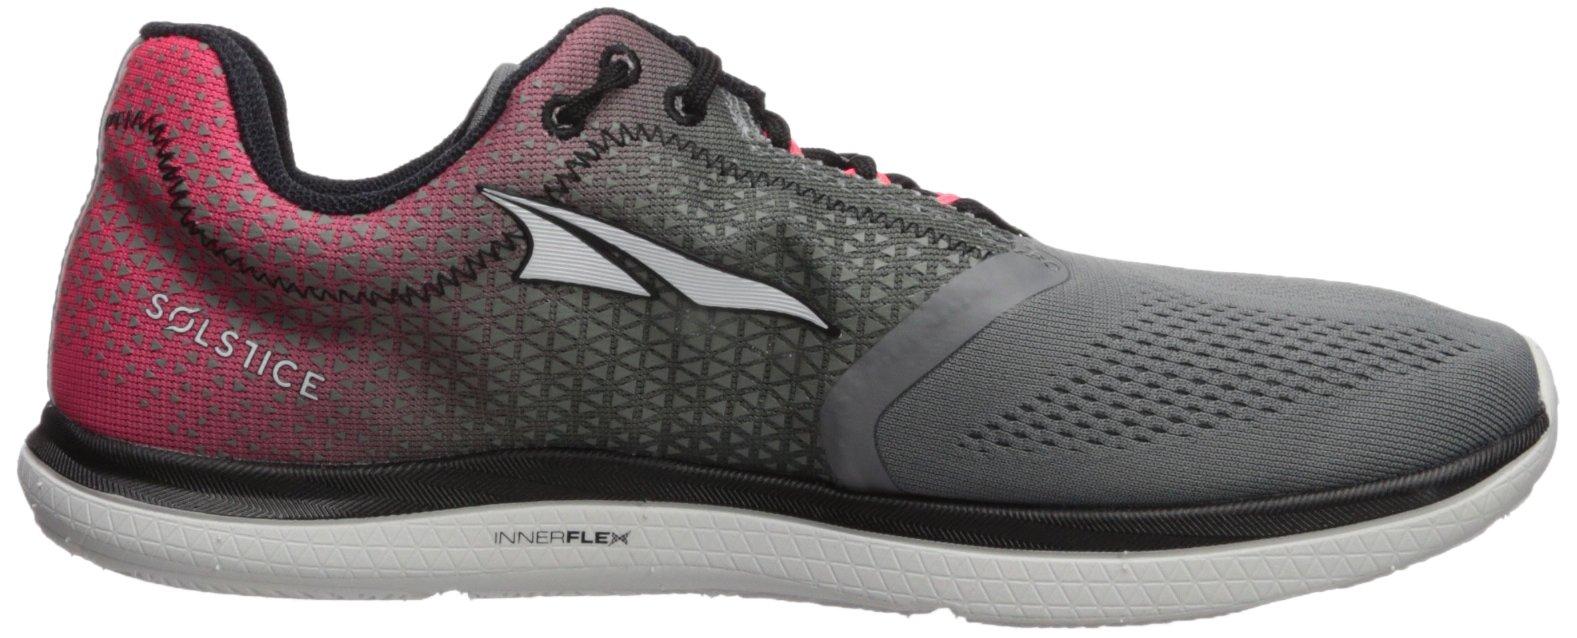 Altra Men's Solstice Sneaker Pink/Gray 7 Regular US by Altra (Image #6)